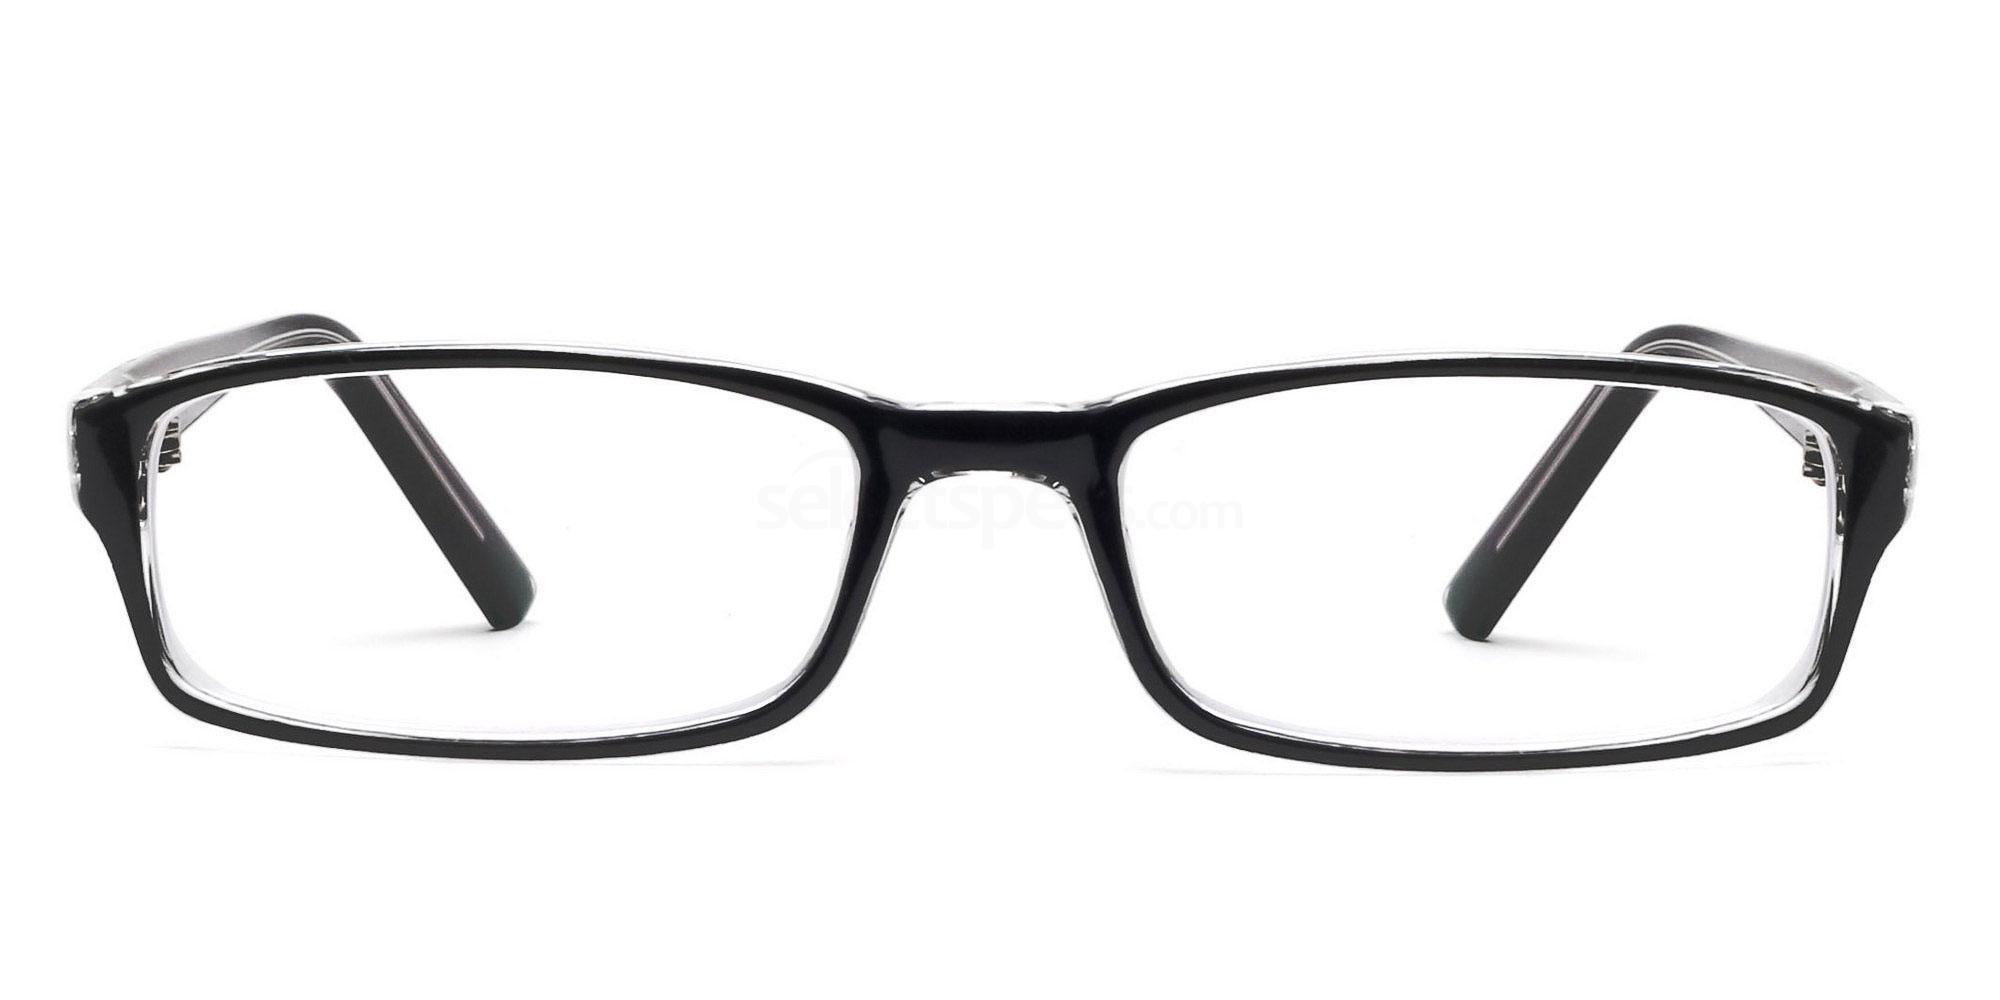 COL.33 2264 - Black and Clear Glasses, Savannah